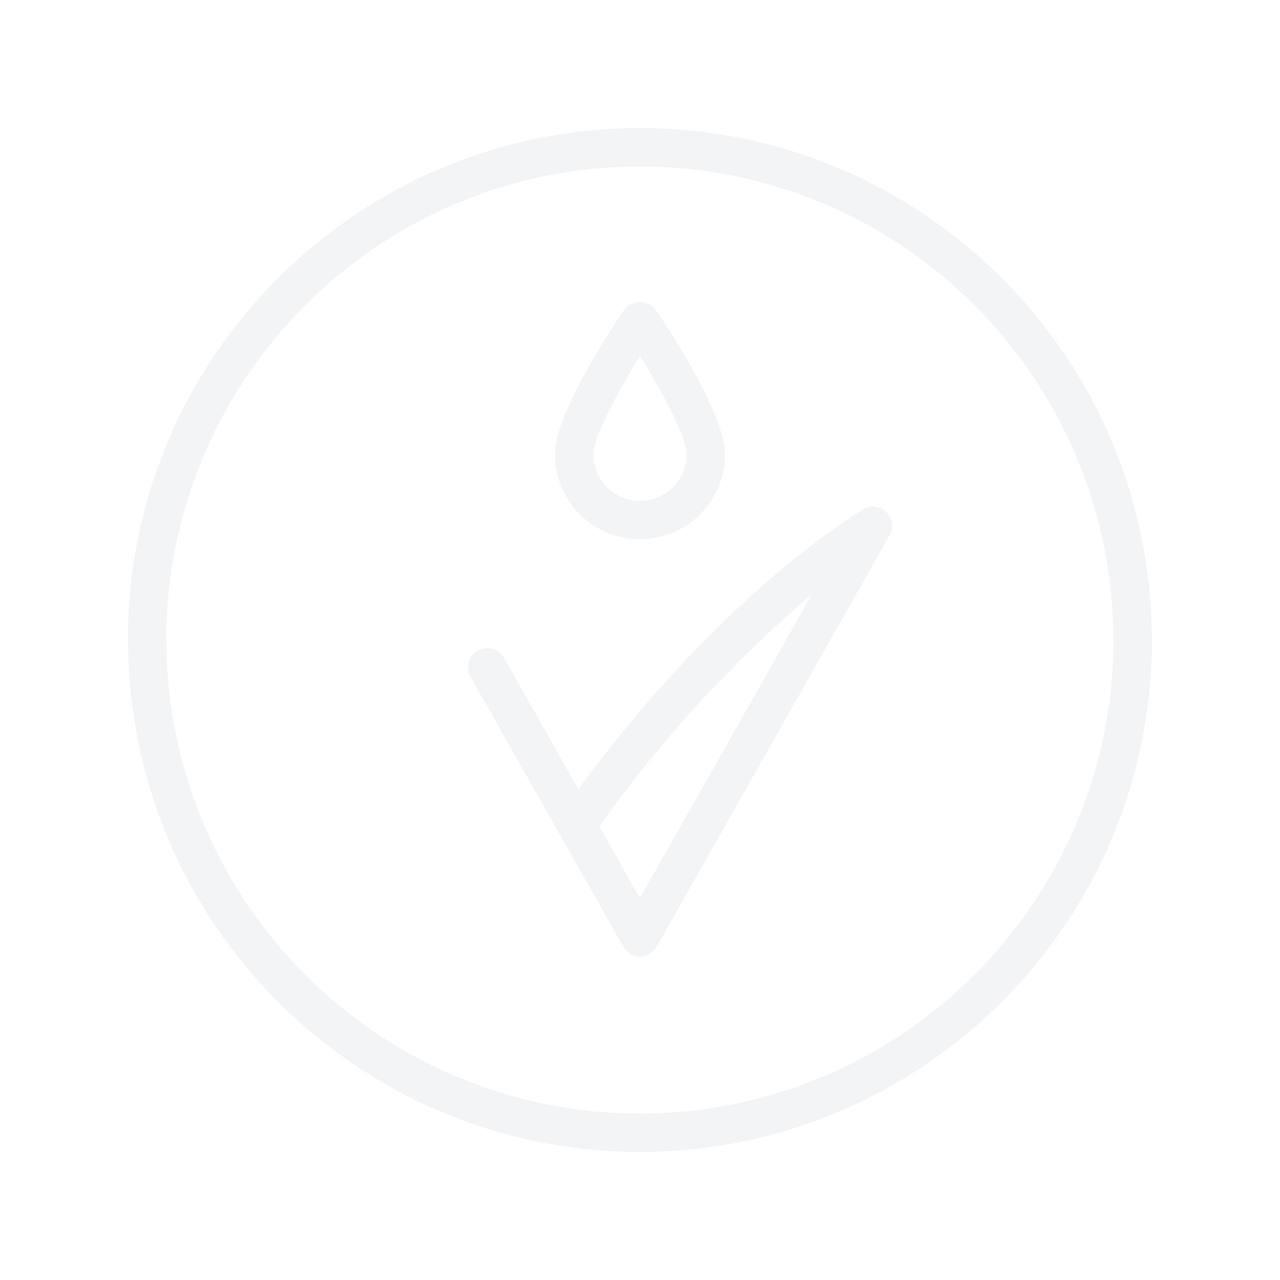 CALVIN KLEIN Women 30ml Eau De Parfum Gift Set